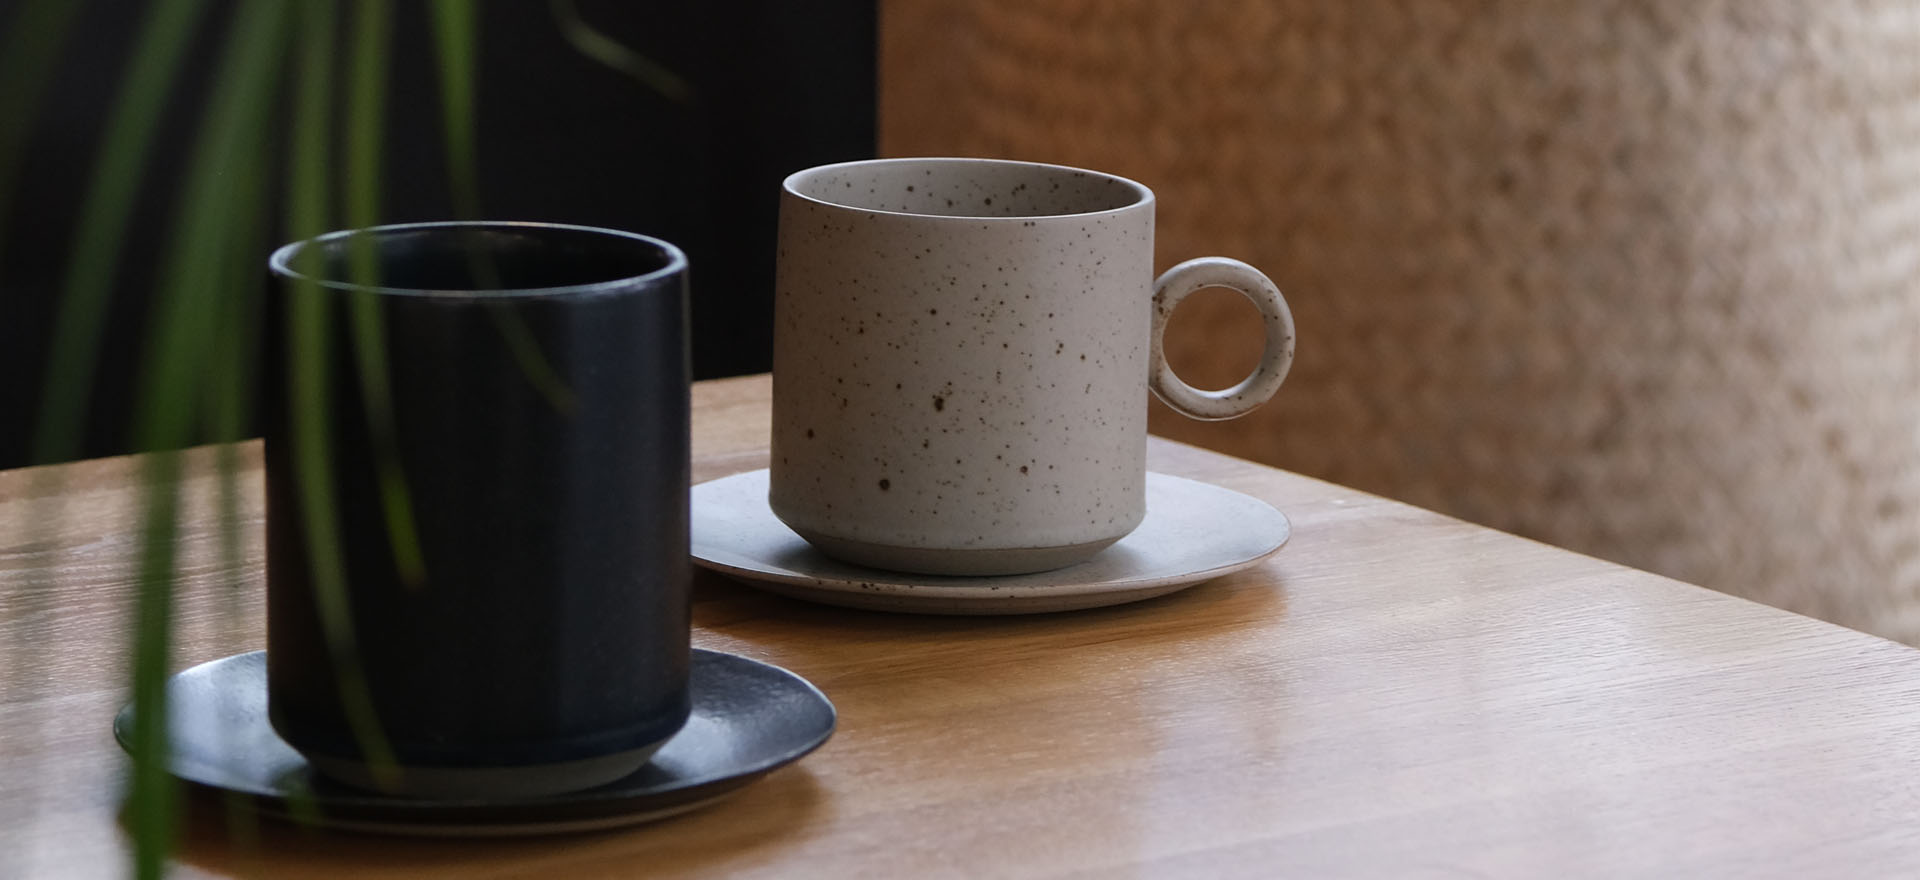 Kaffee bestellen Geschäftskunden